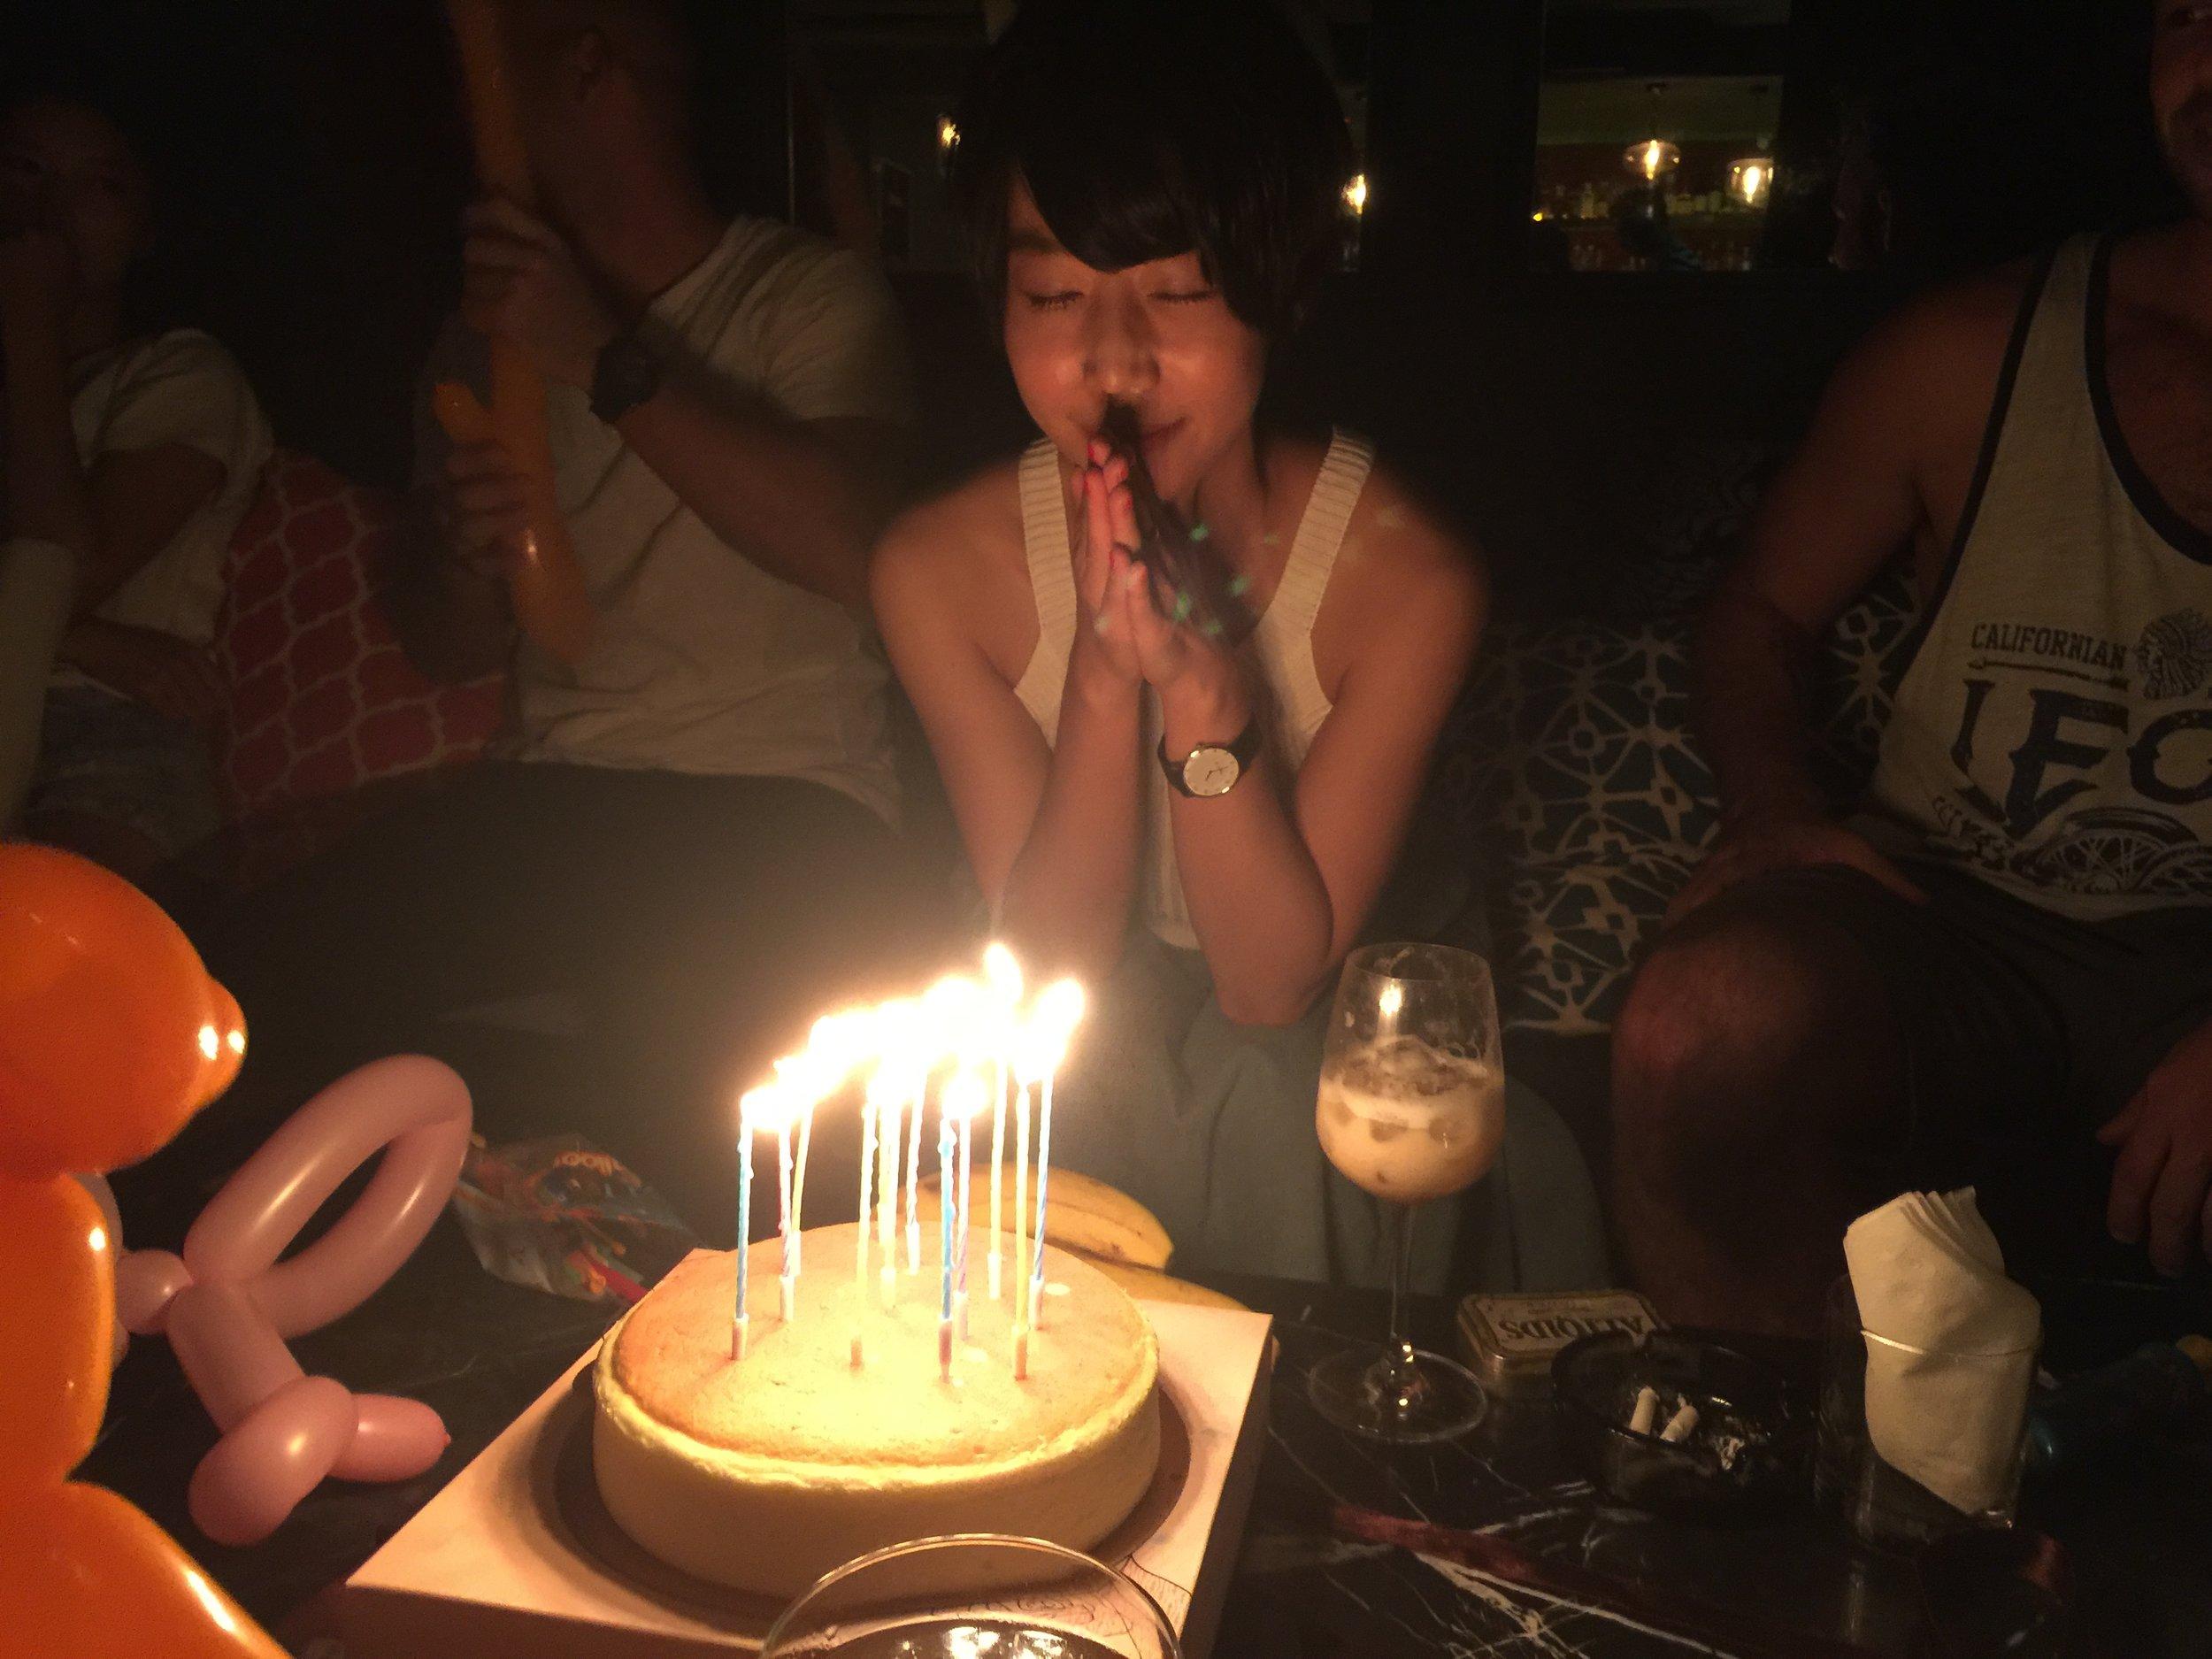 Happy Birthday, Tiffany!